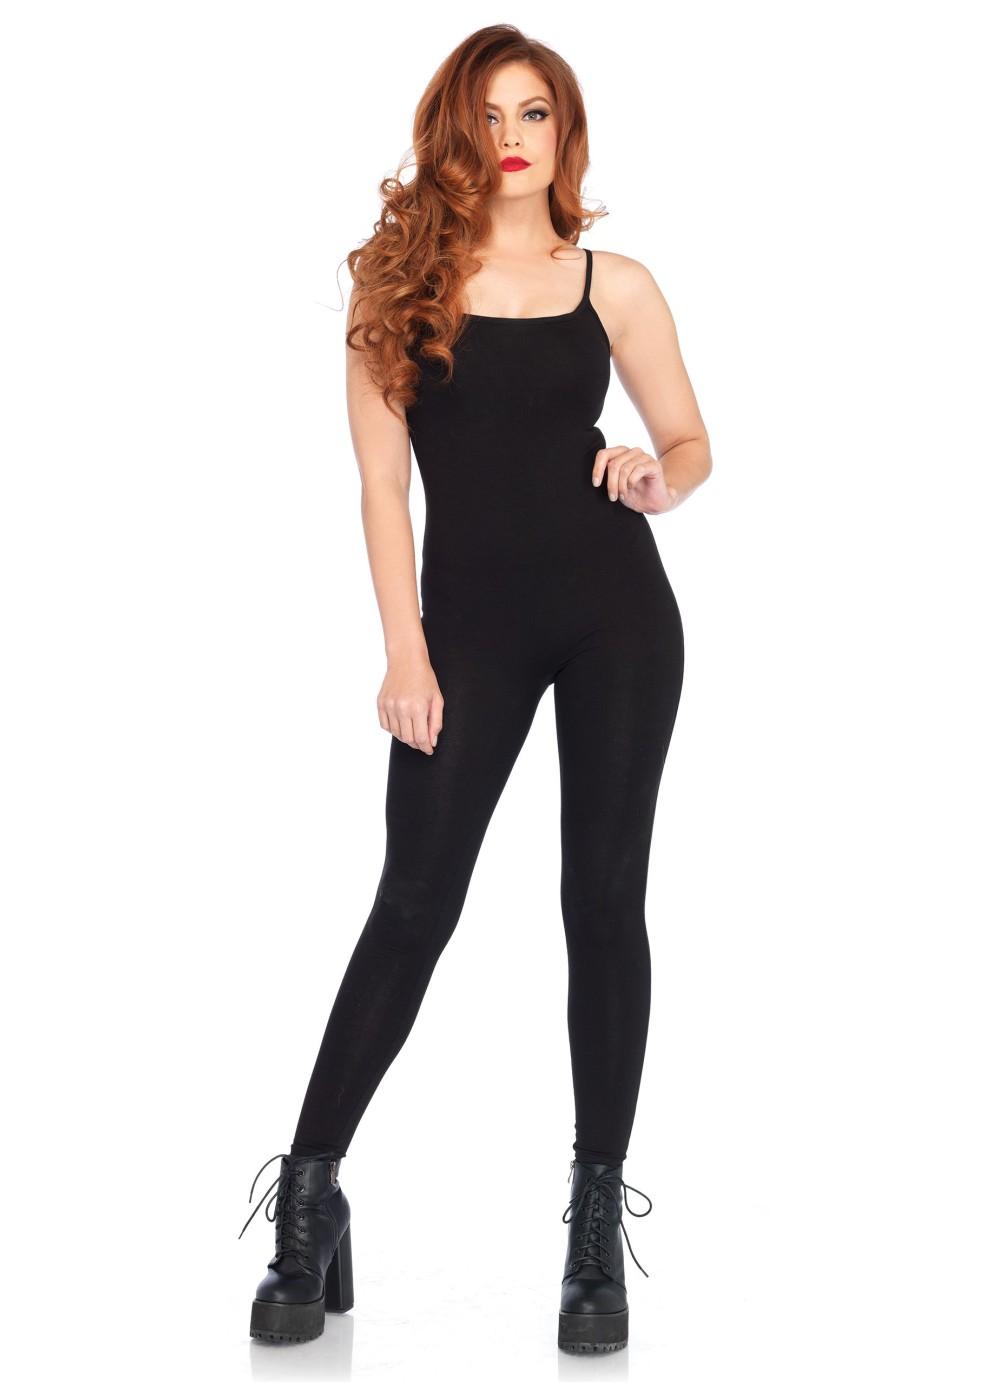 Black Basic Unitard Women - Dancewear Costumes